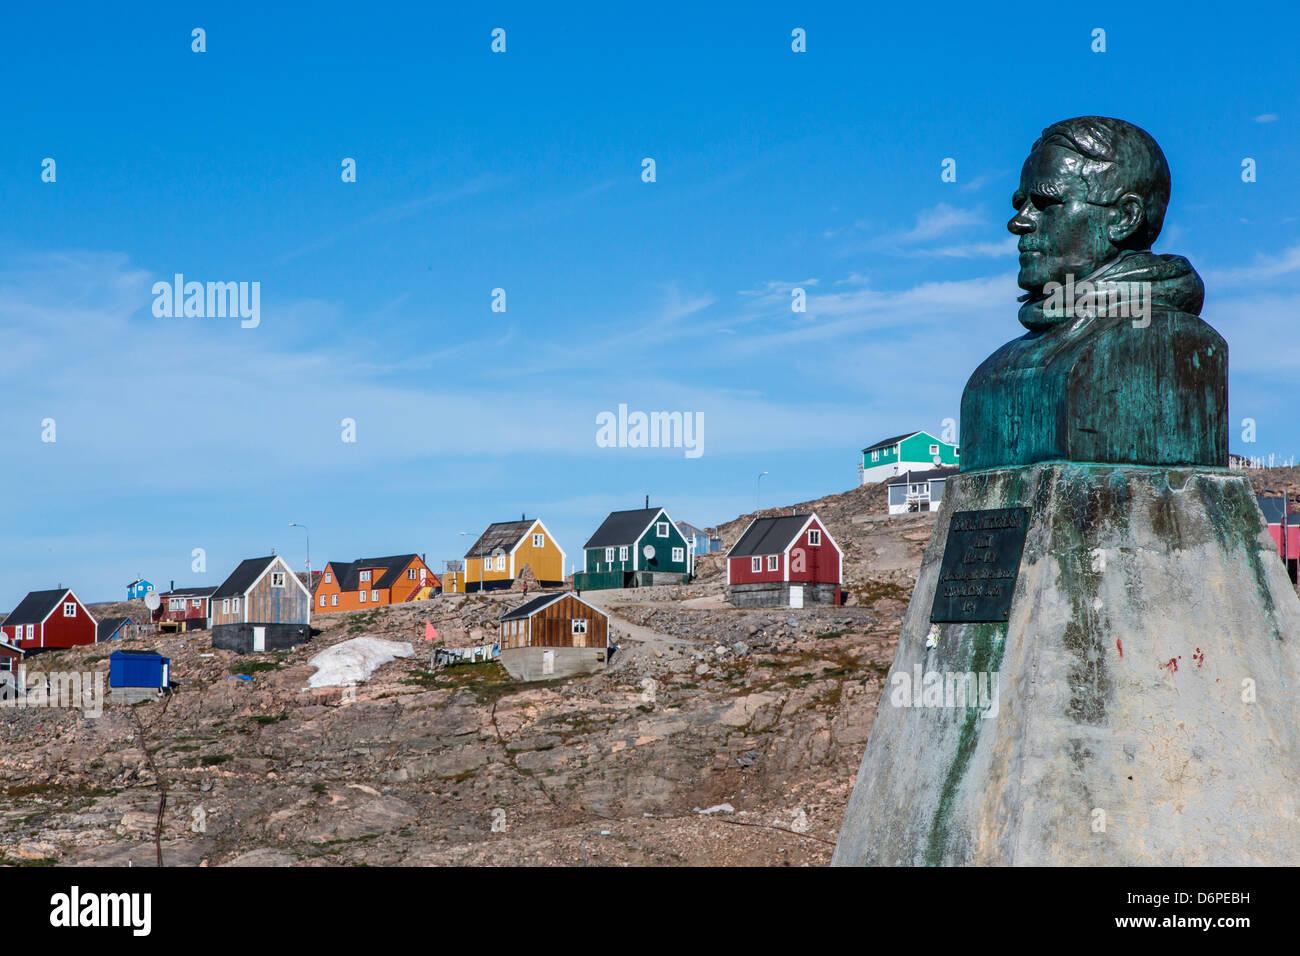 Inuit village and Ejnar Mikkelsen statue, Ittoqqortoormiit, Scoresbysund, Northeast Greenland, Polar Regions - Stock Image